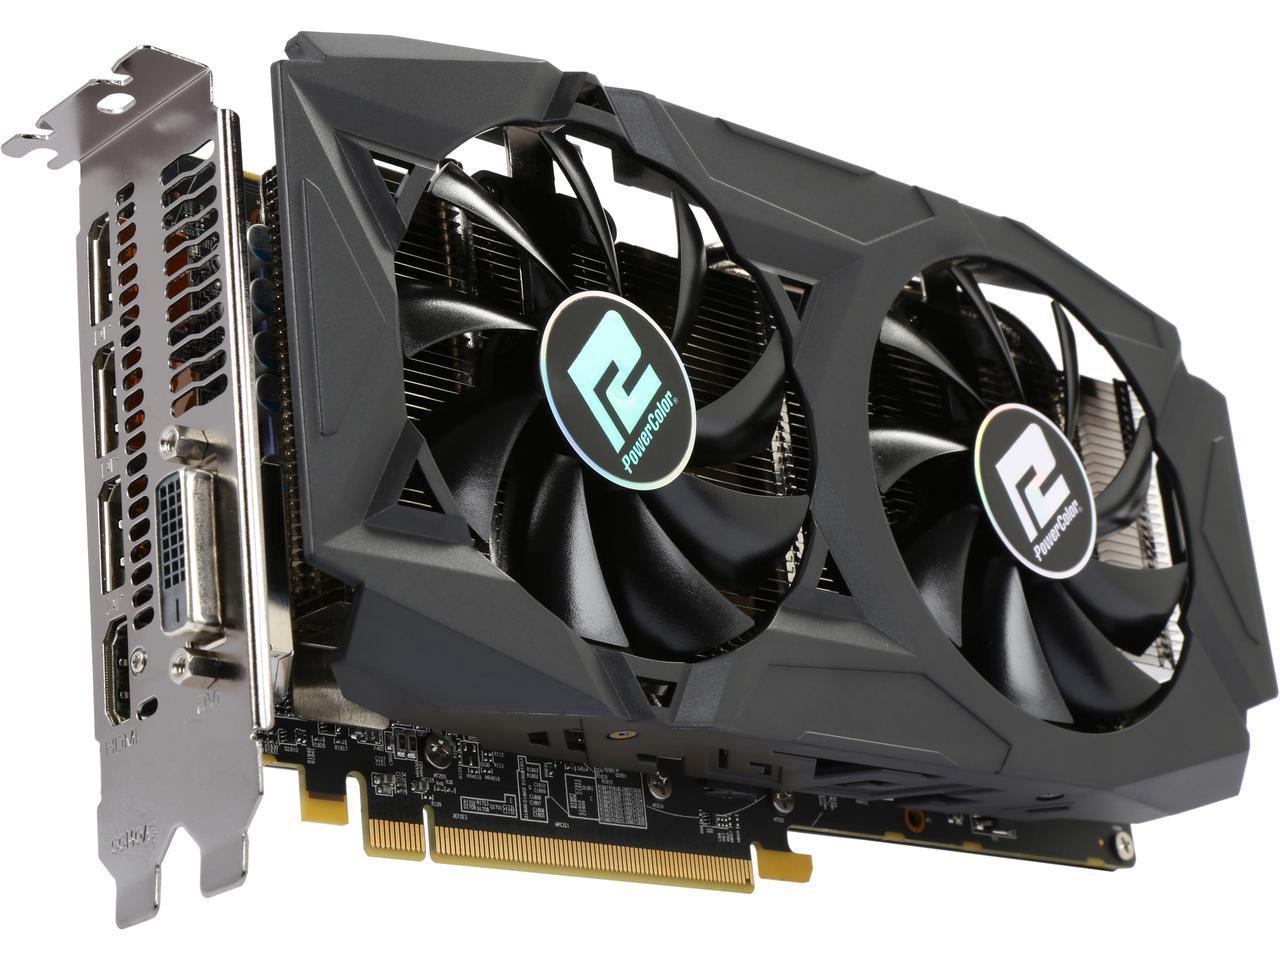 PowerColor RED DRAGON Radeon RX 580 DirectX 12 AXRX 580 8GBD5-3DHDV2/OC 8GB 256-Bit GDDR5 PCI Express 3.0 CrossFireX Support ATX Video Card AR $199.99